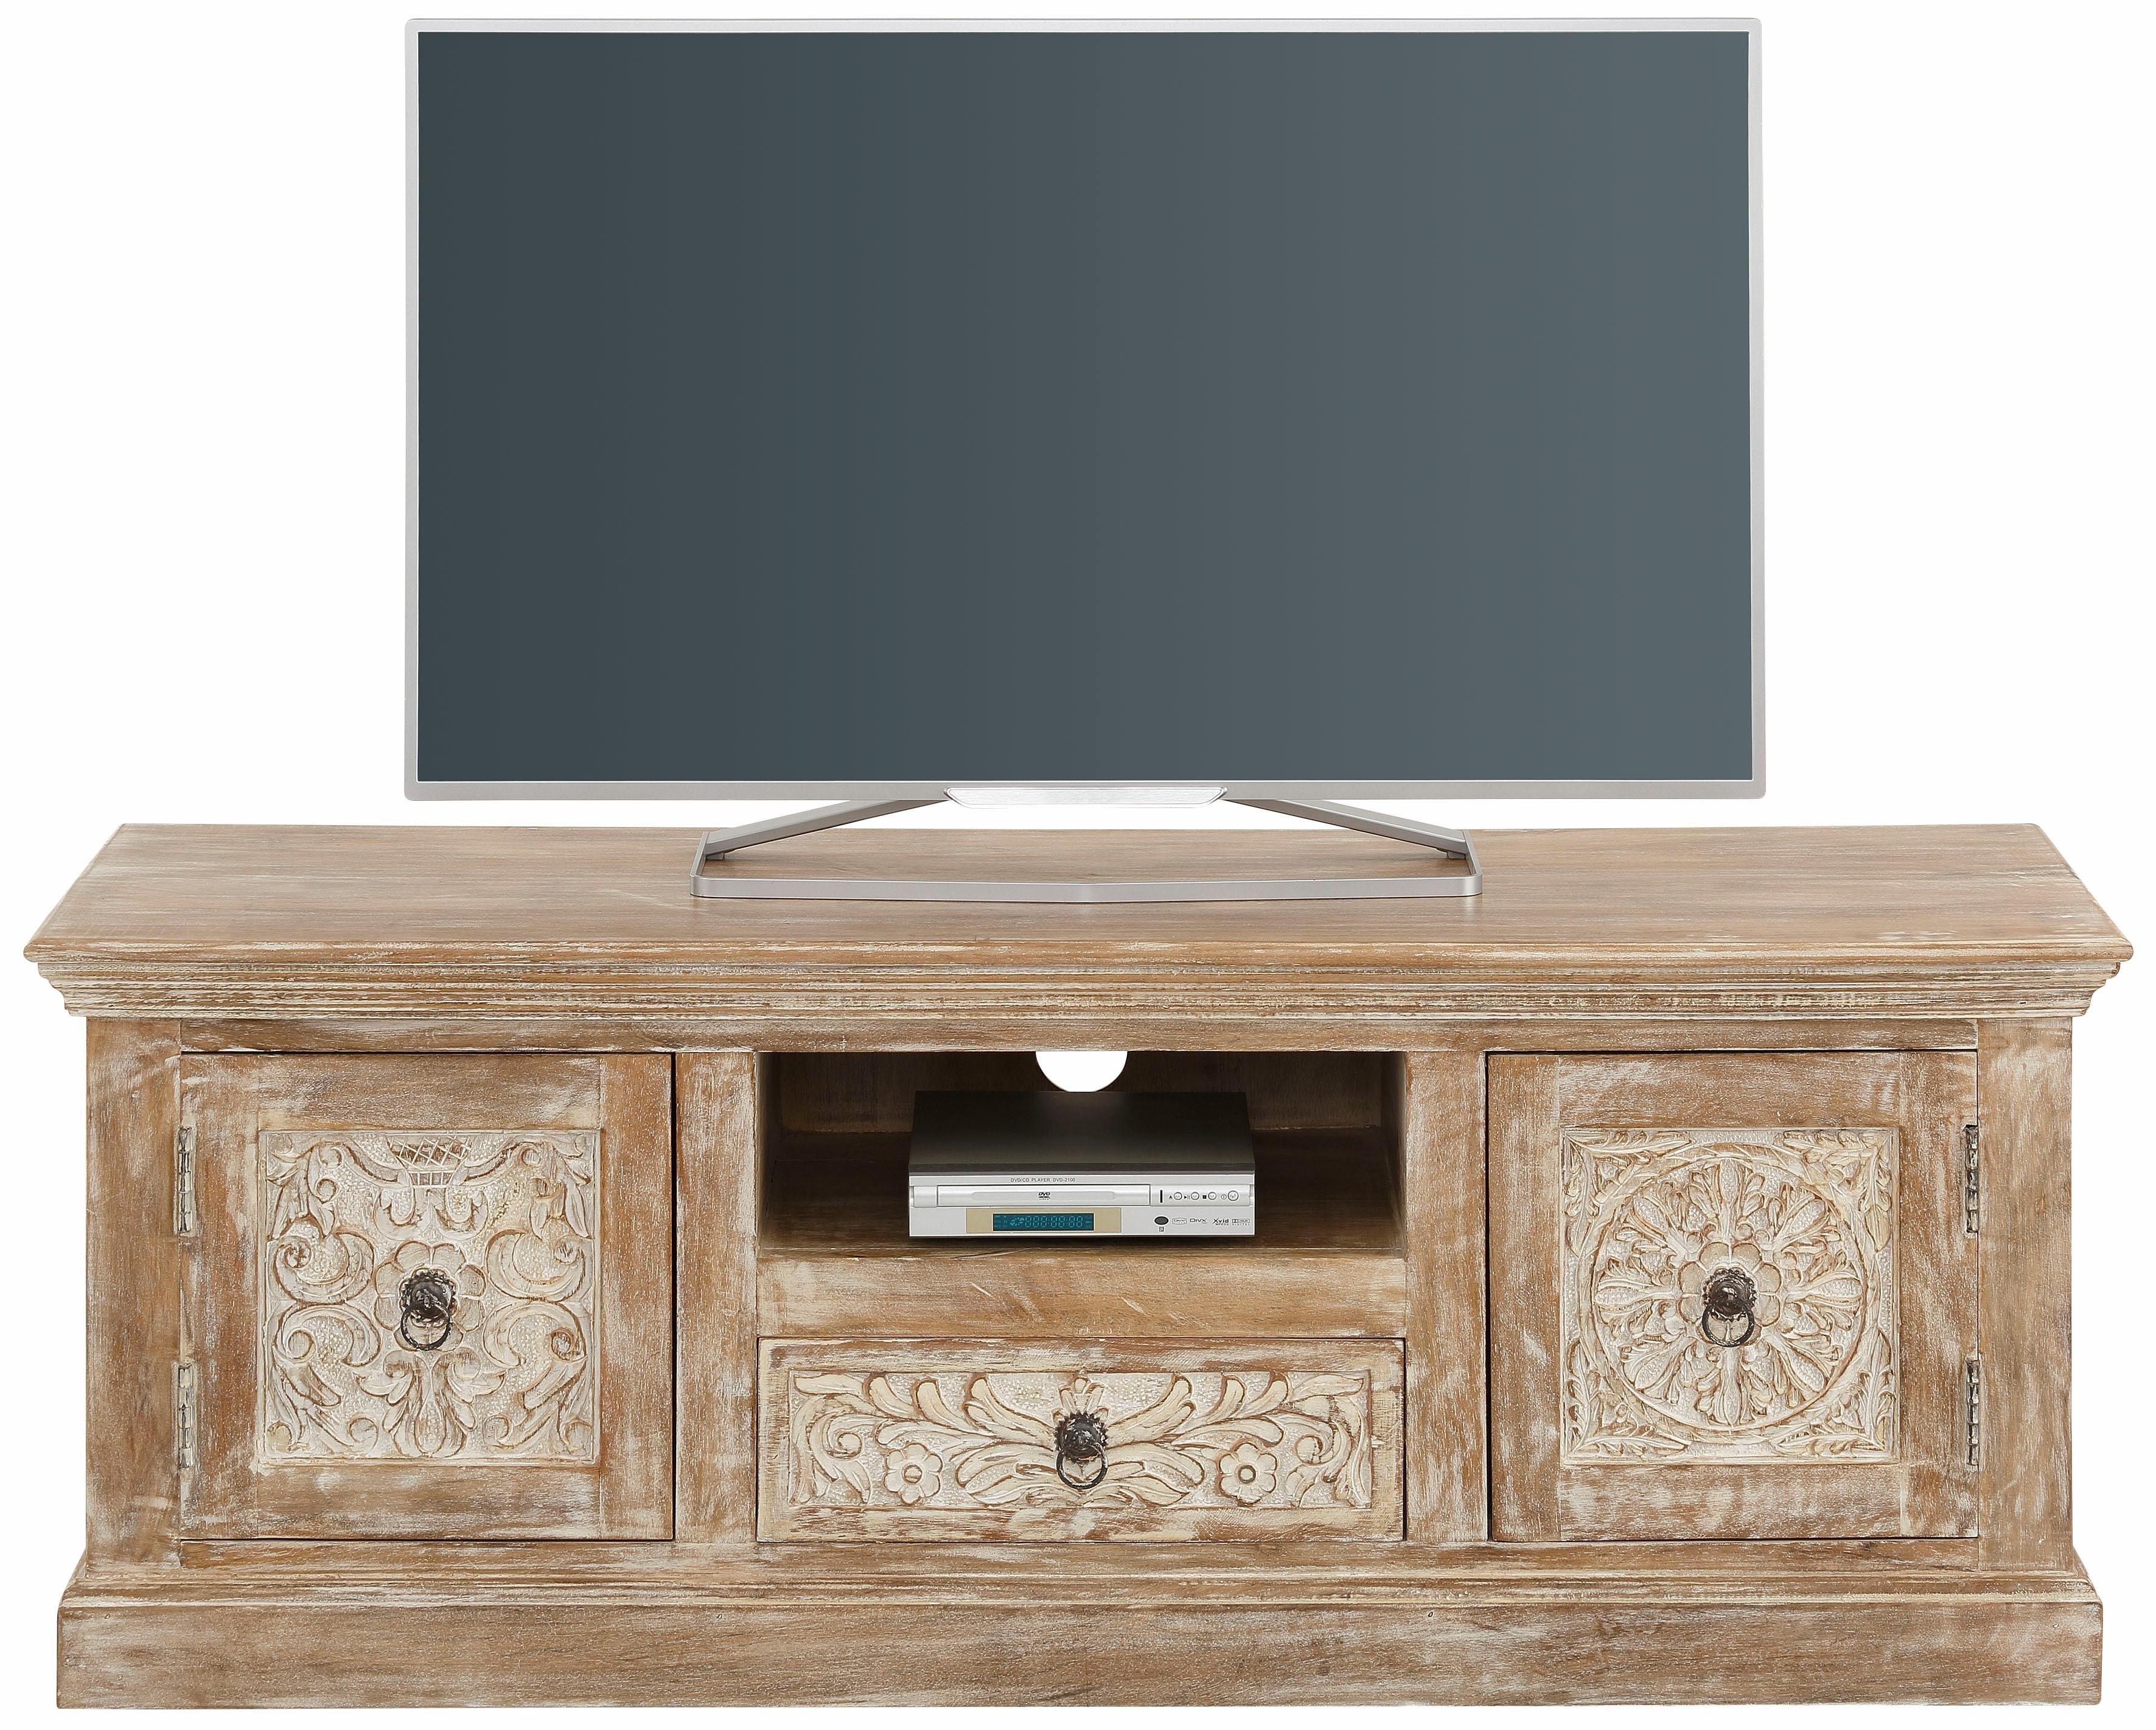 Home affaire tv-meubel Malati Breedte 135 cm - gratis ruilen op otto.nl